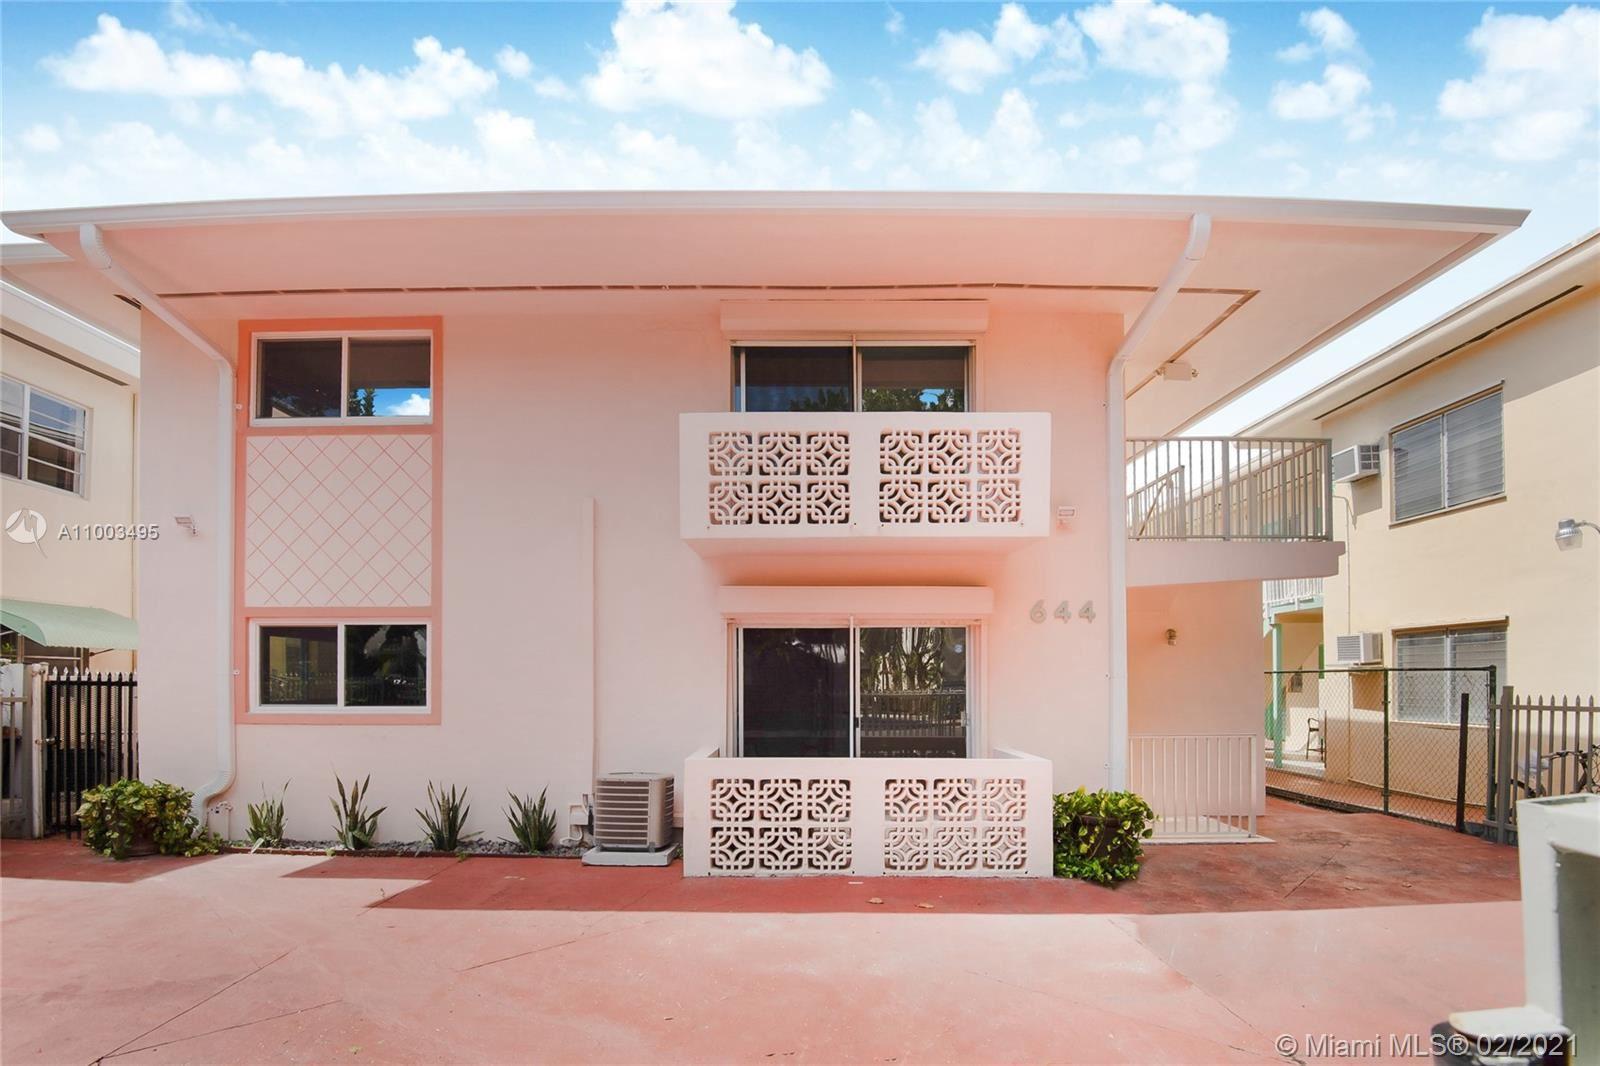 644 Meridian Ave #10, Miami Beach, FL 33139 - #: A11003495